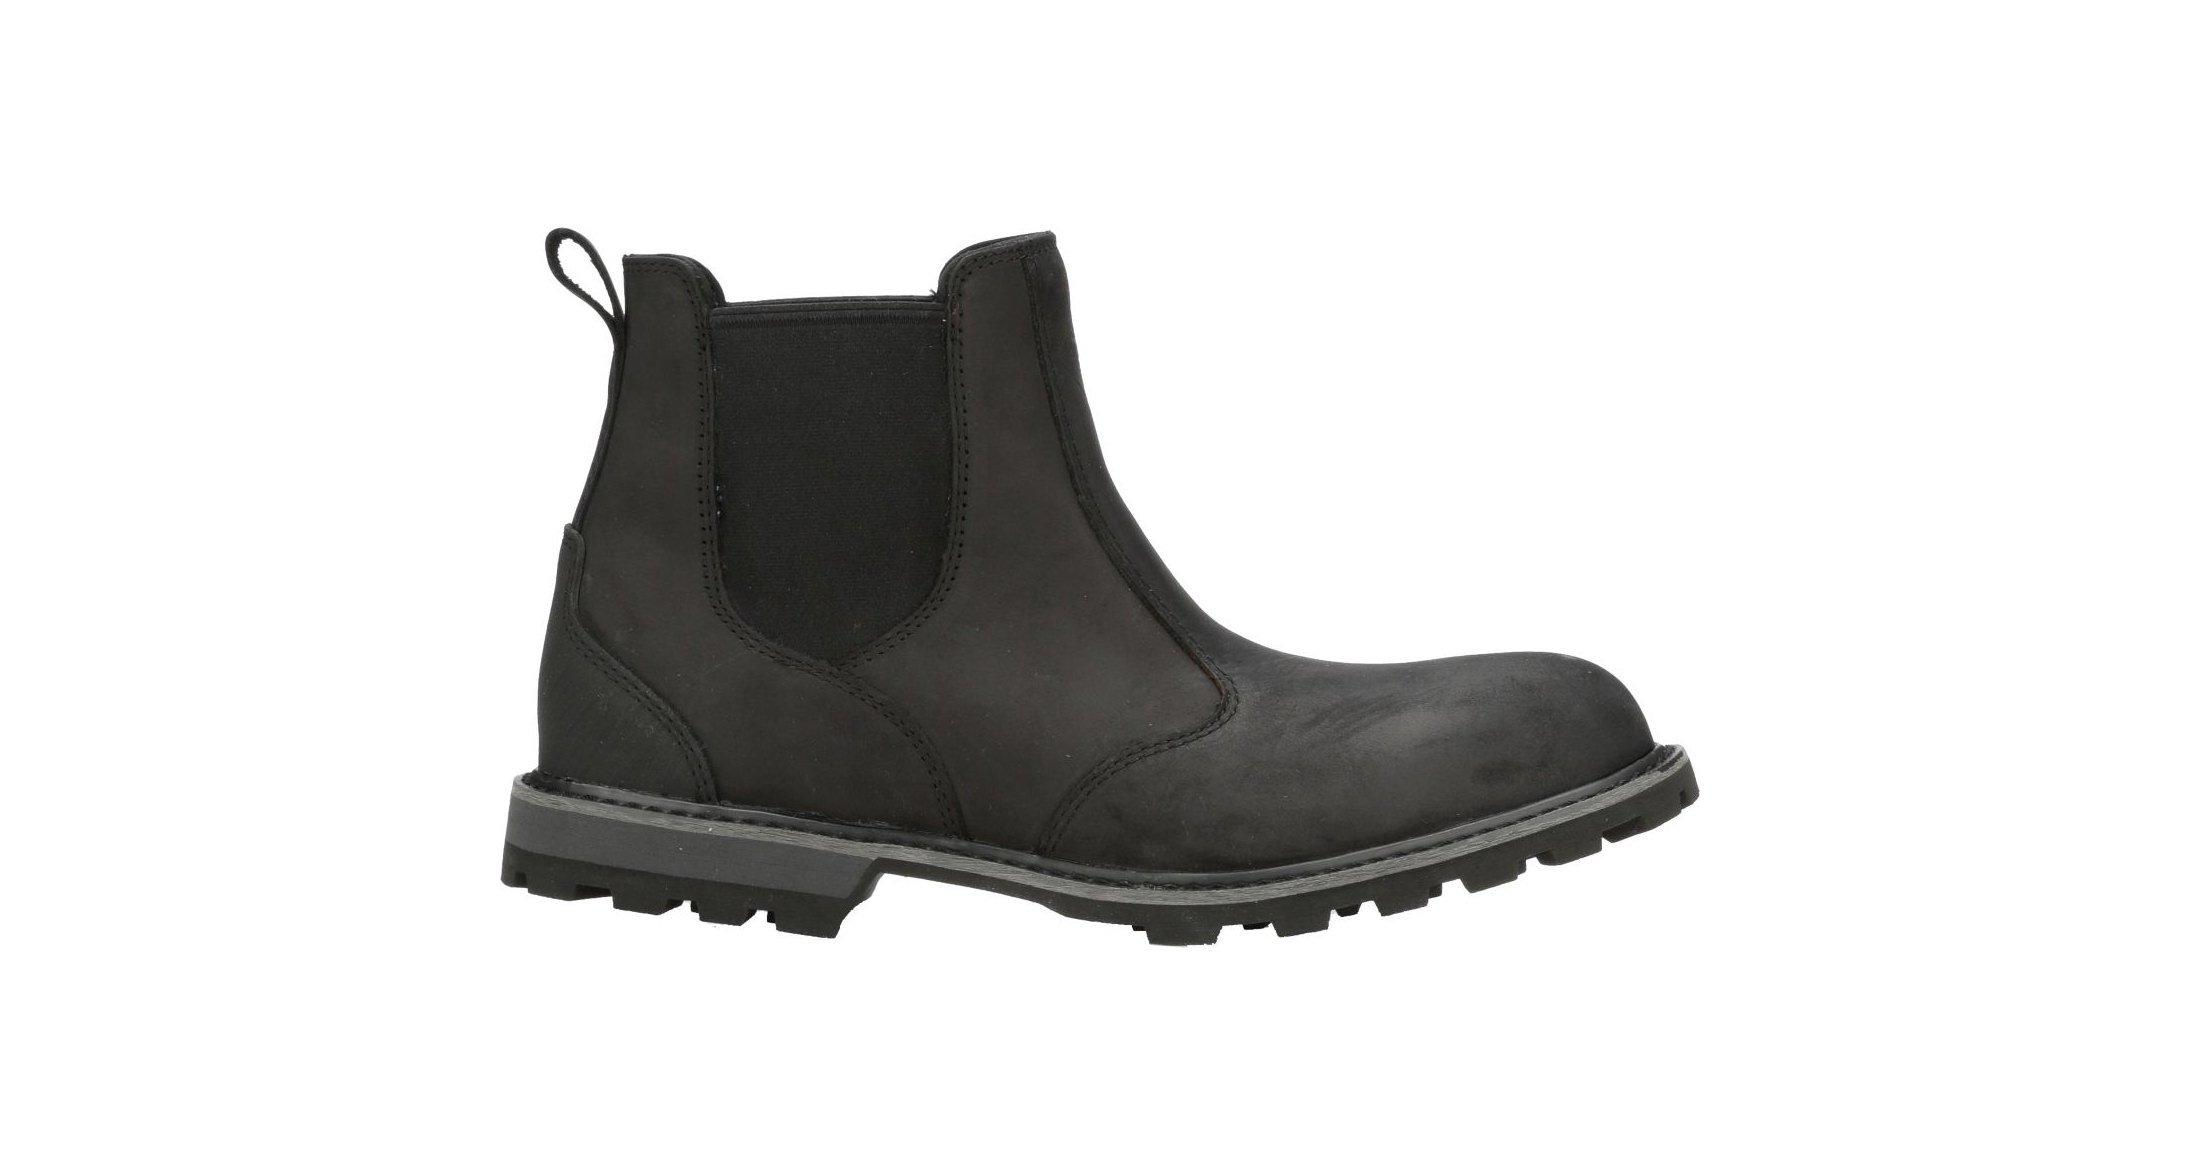 Muck Boot Waterproof Chelsea Side